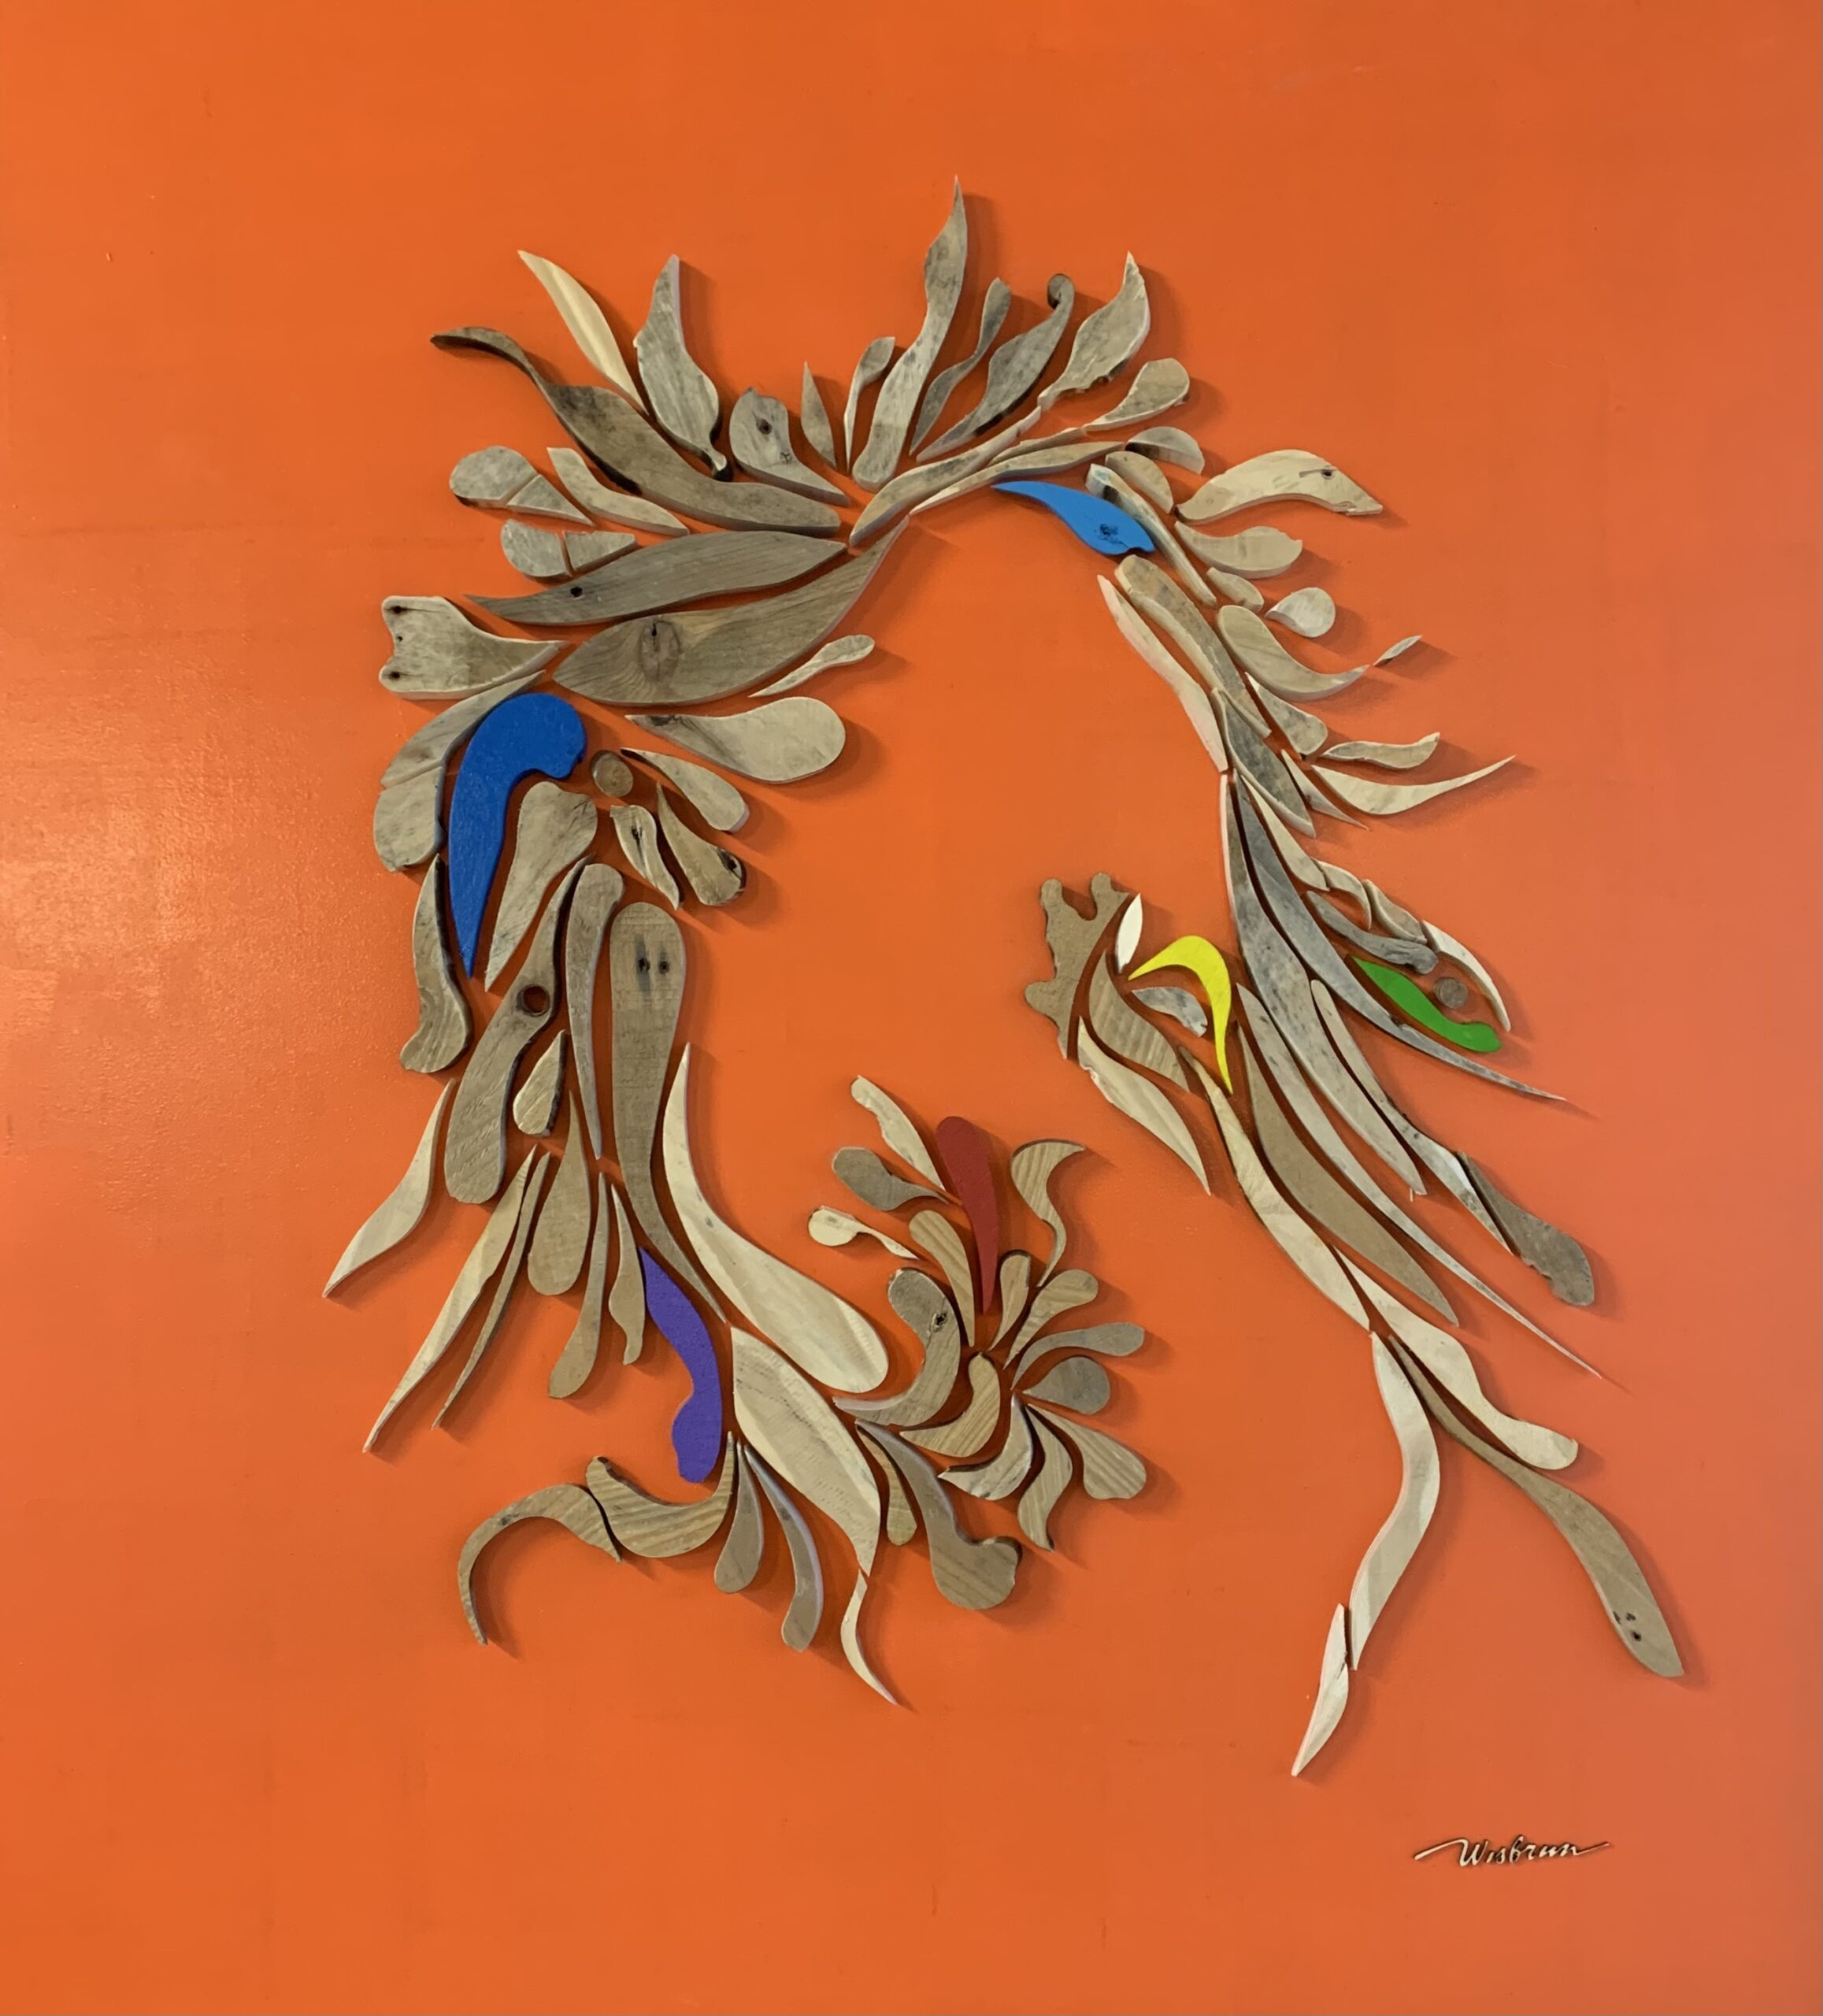 OranjeOrangeNaranja - 110 x 122 cm. TE KOOP € 1.200,-